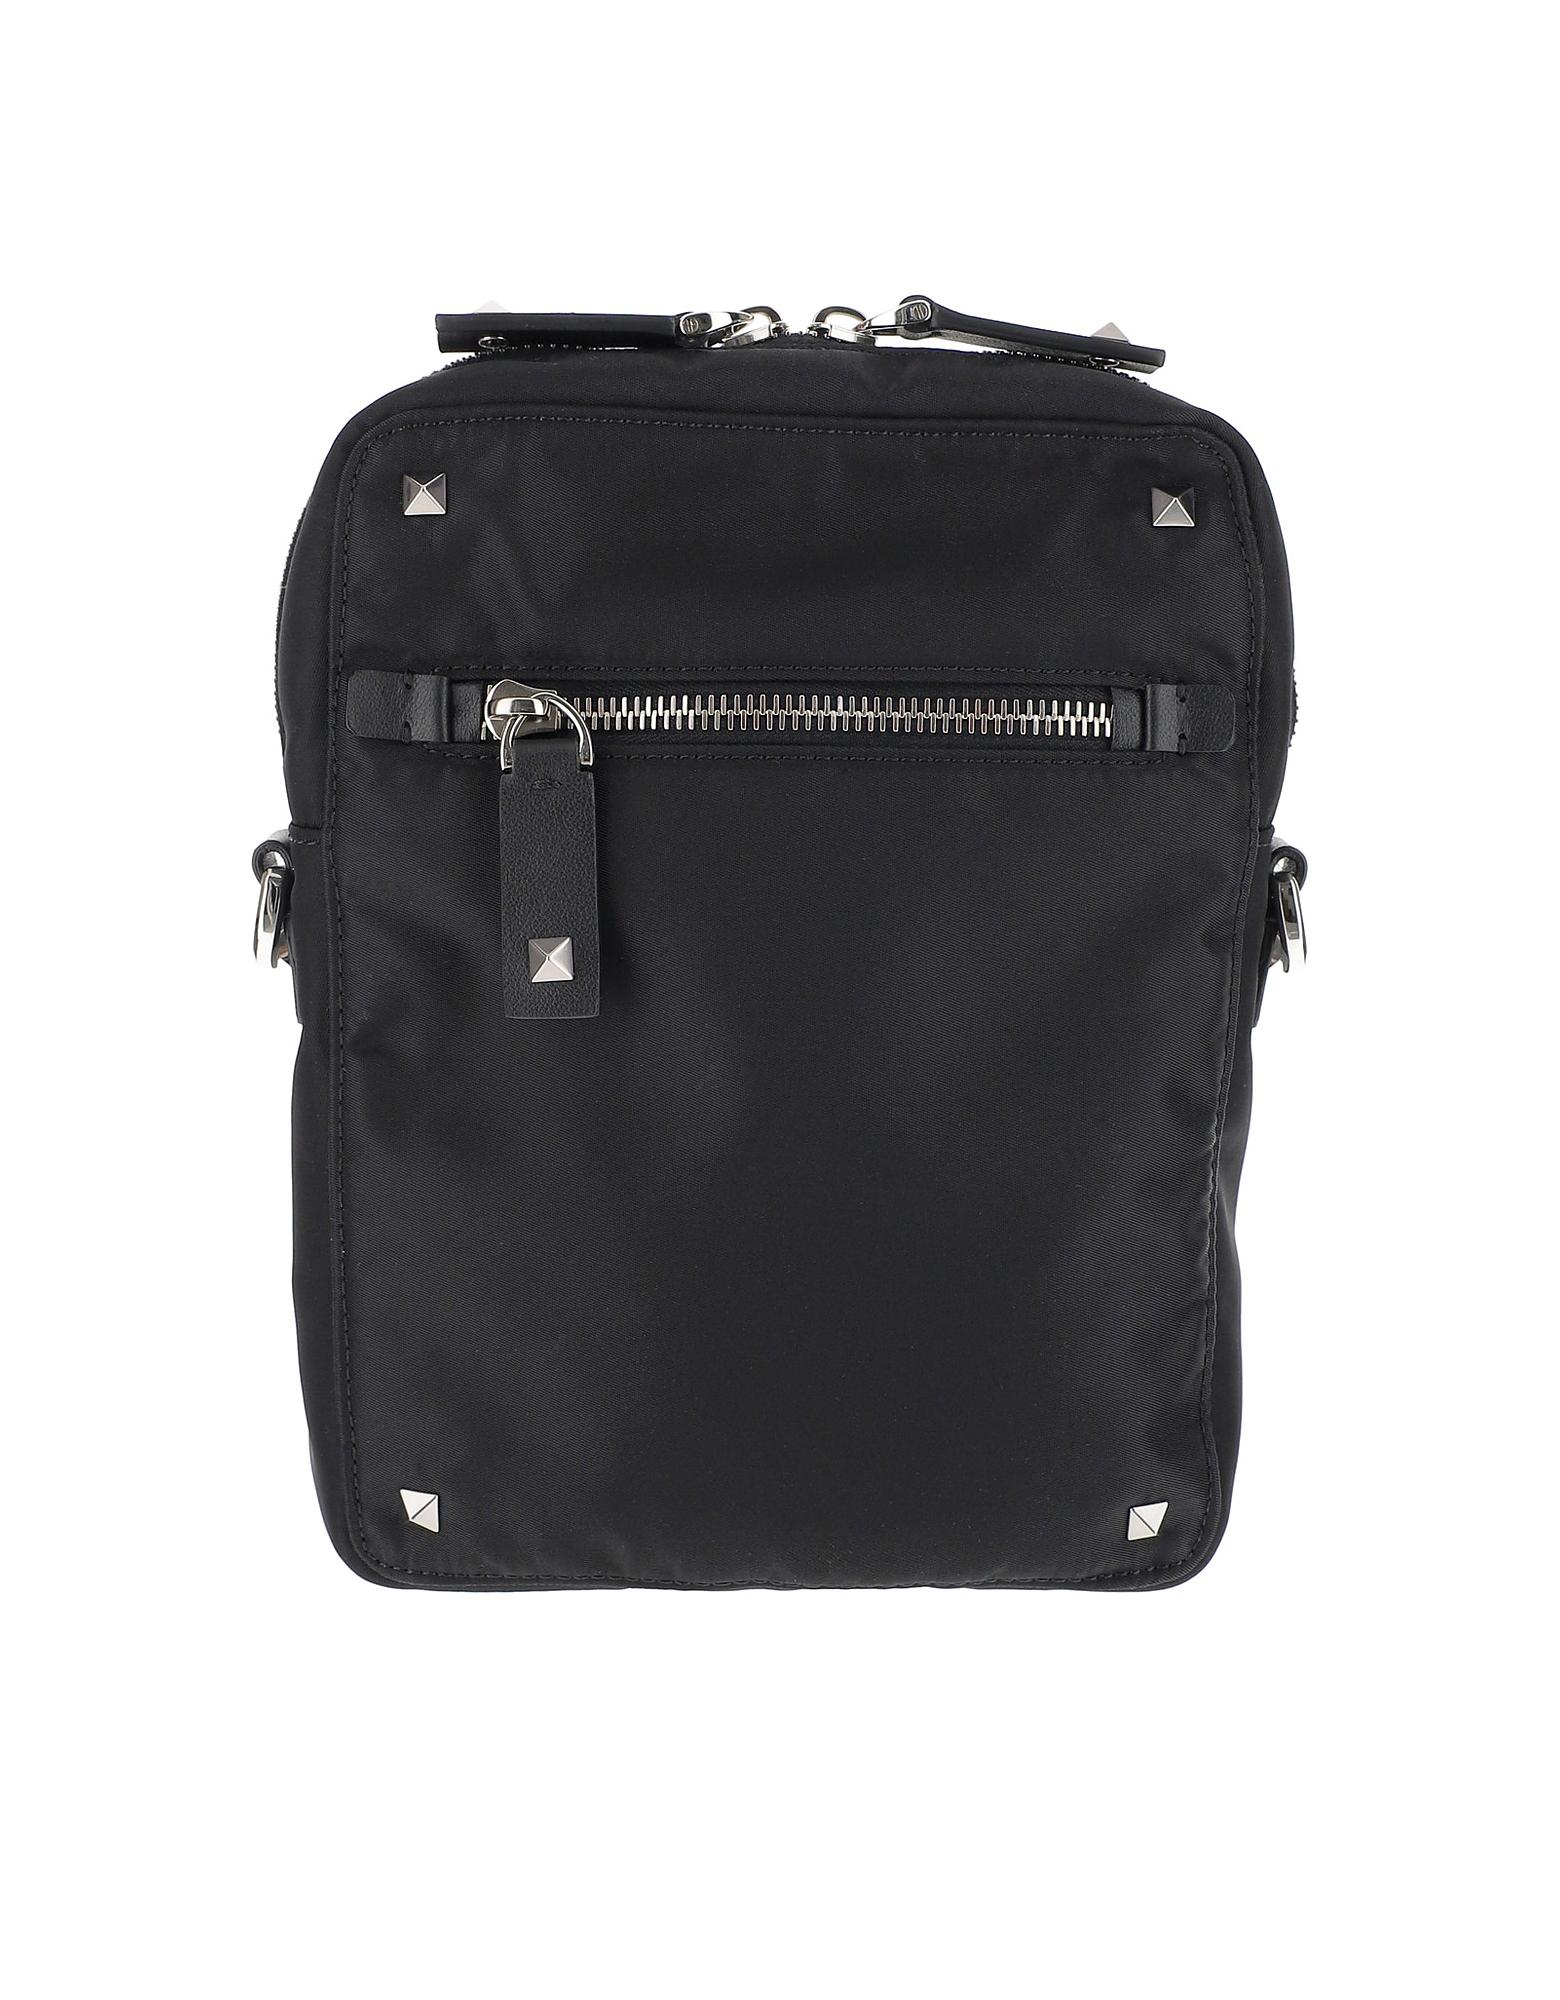 Valentino Designer Men's Bags, Black Nylon Shoulder Bag